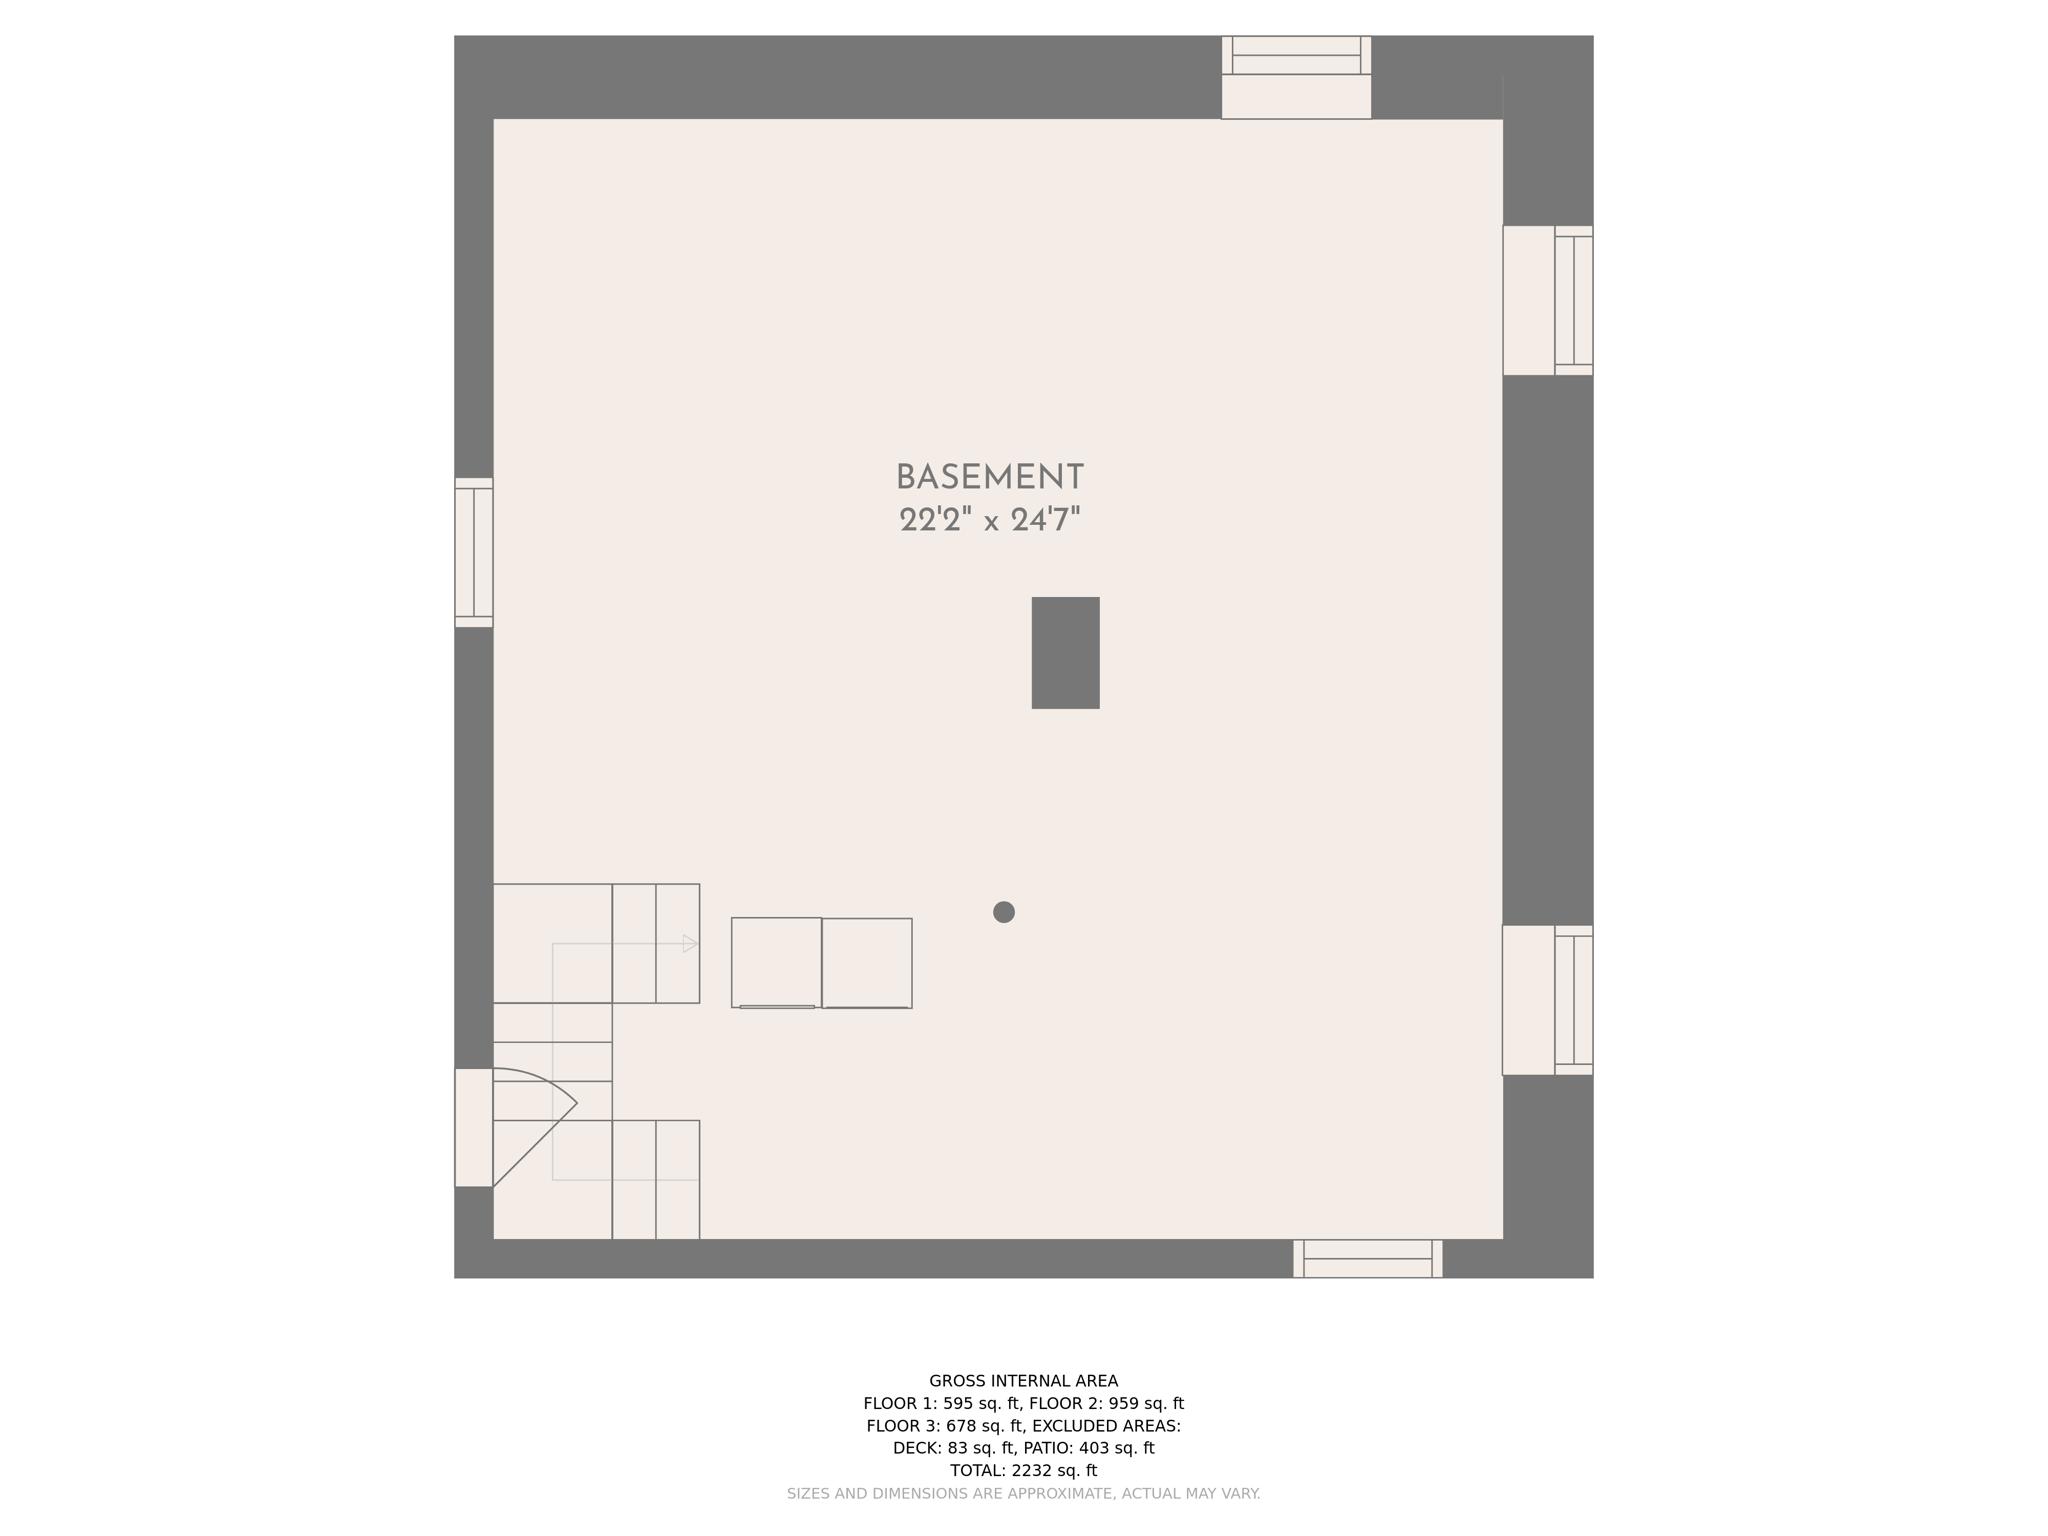 Floorplan Basement